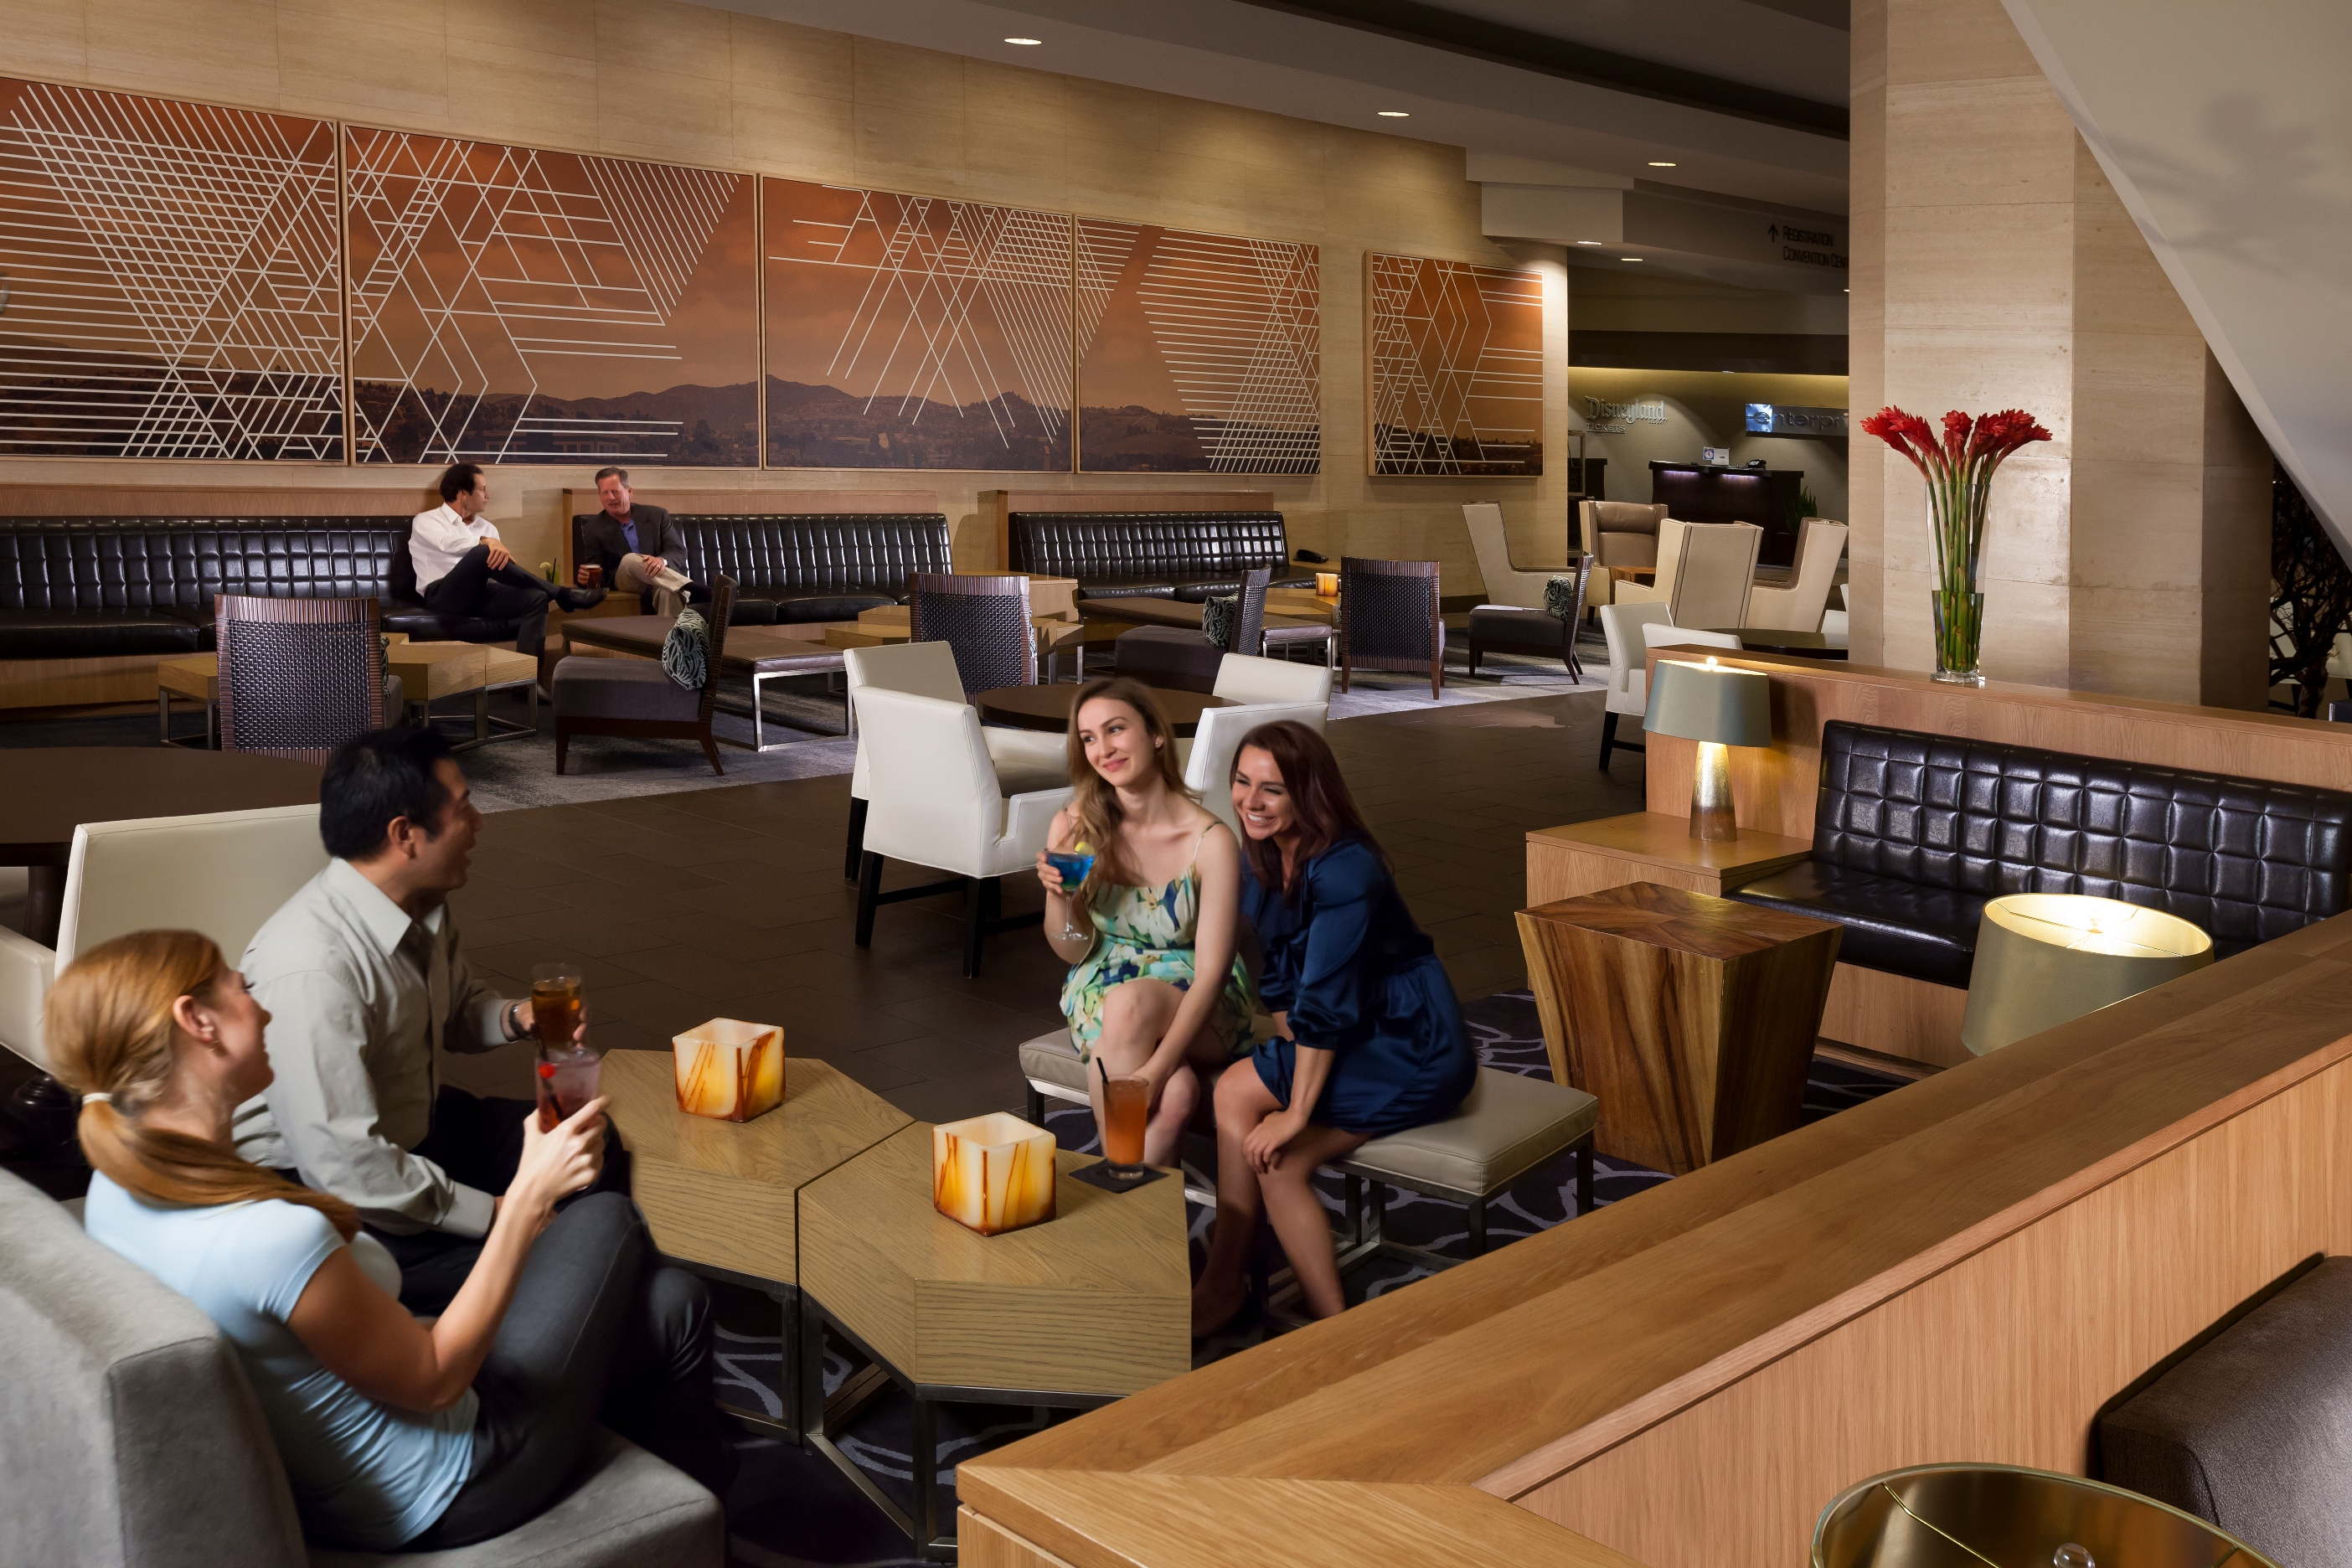 Mix Restaurant Lounge At Hilton Anaheim